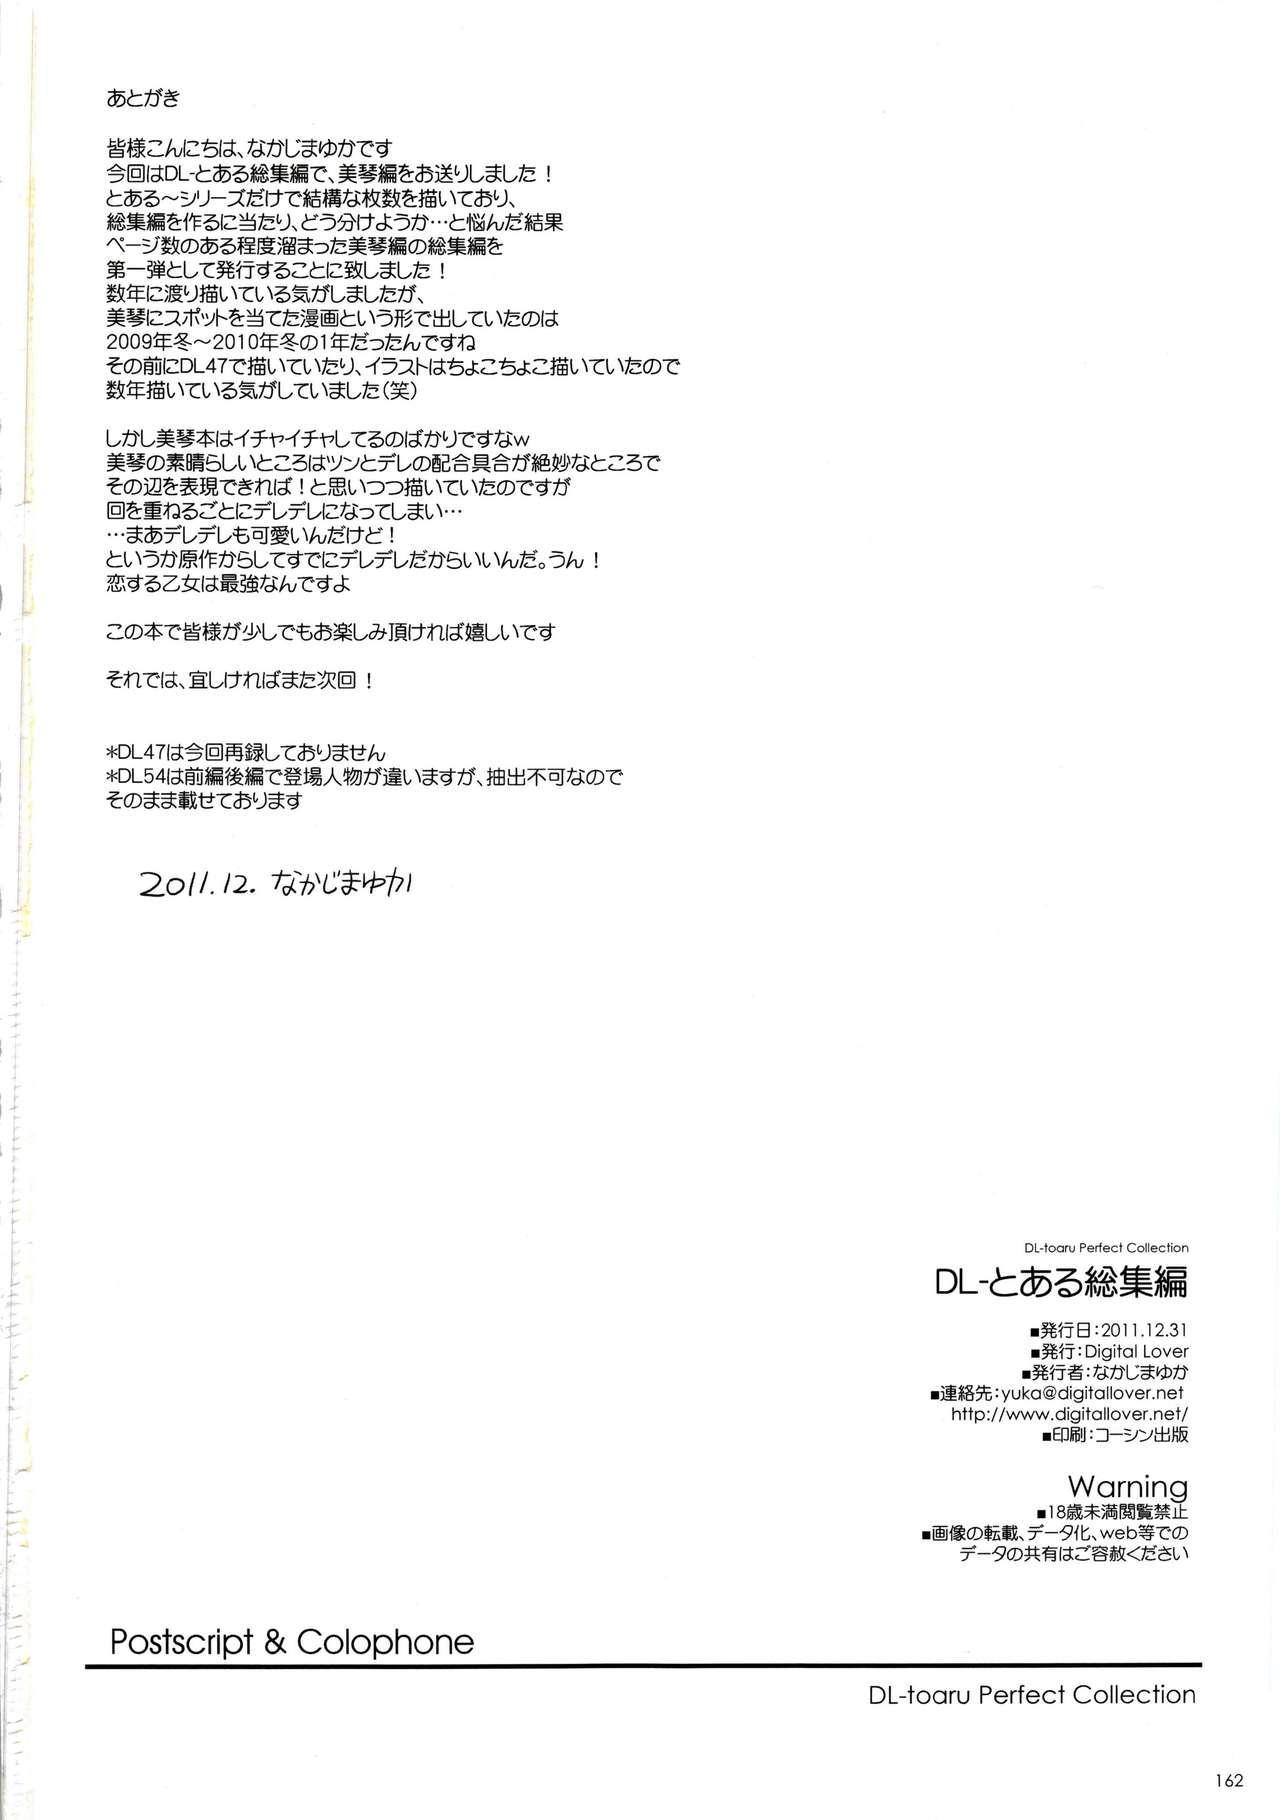 DL - Toaru Soushuuhen 160